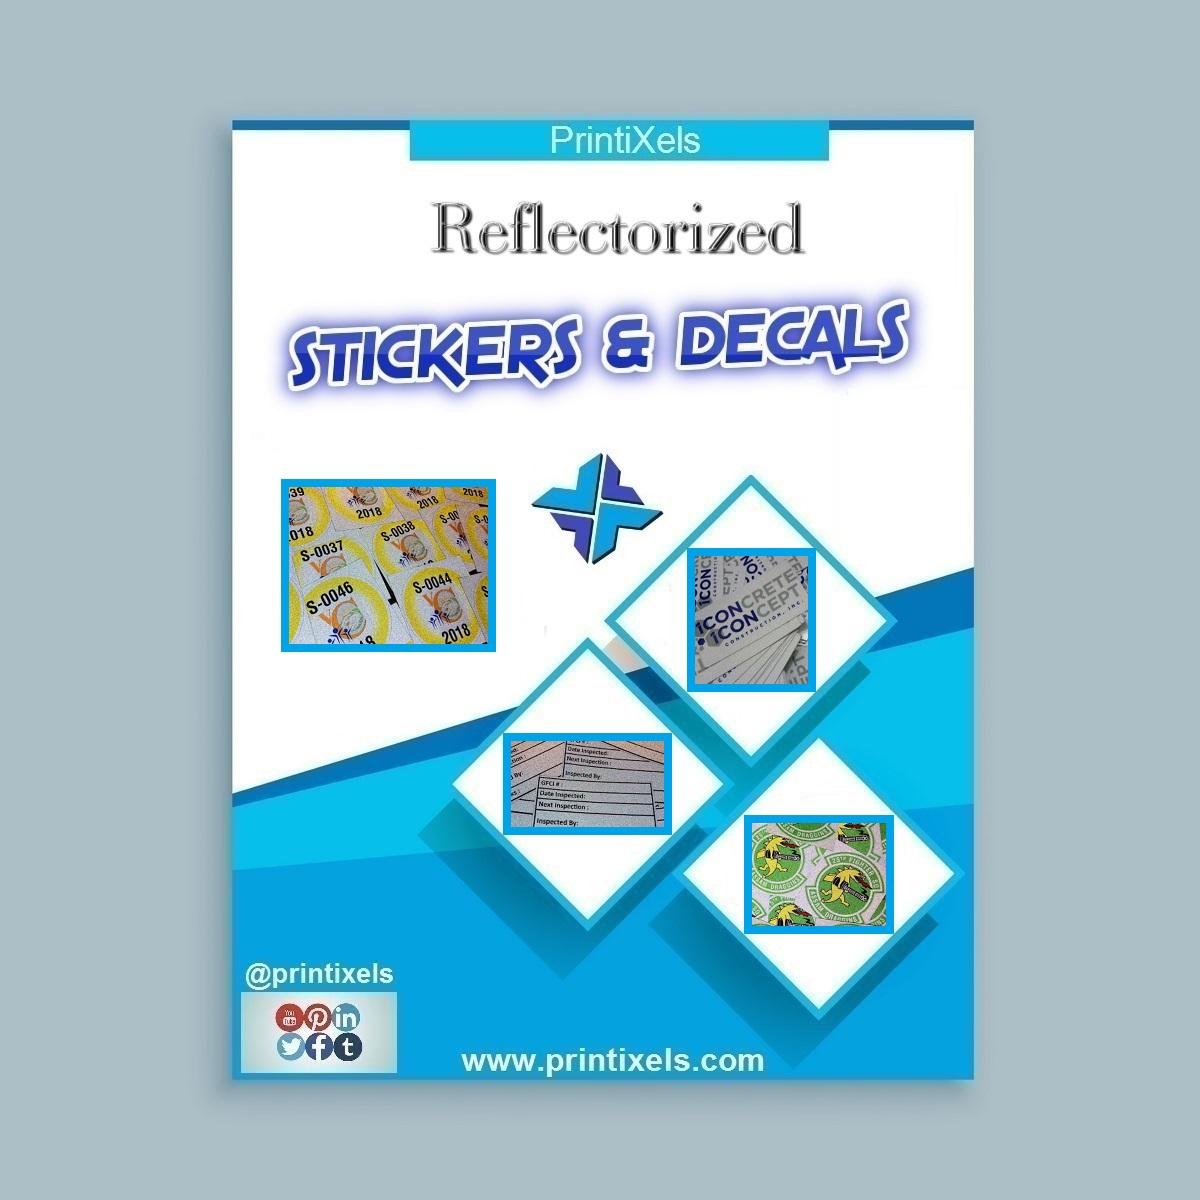 Custom Reflectorized Stickers & Decals Philippines